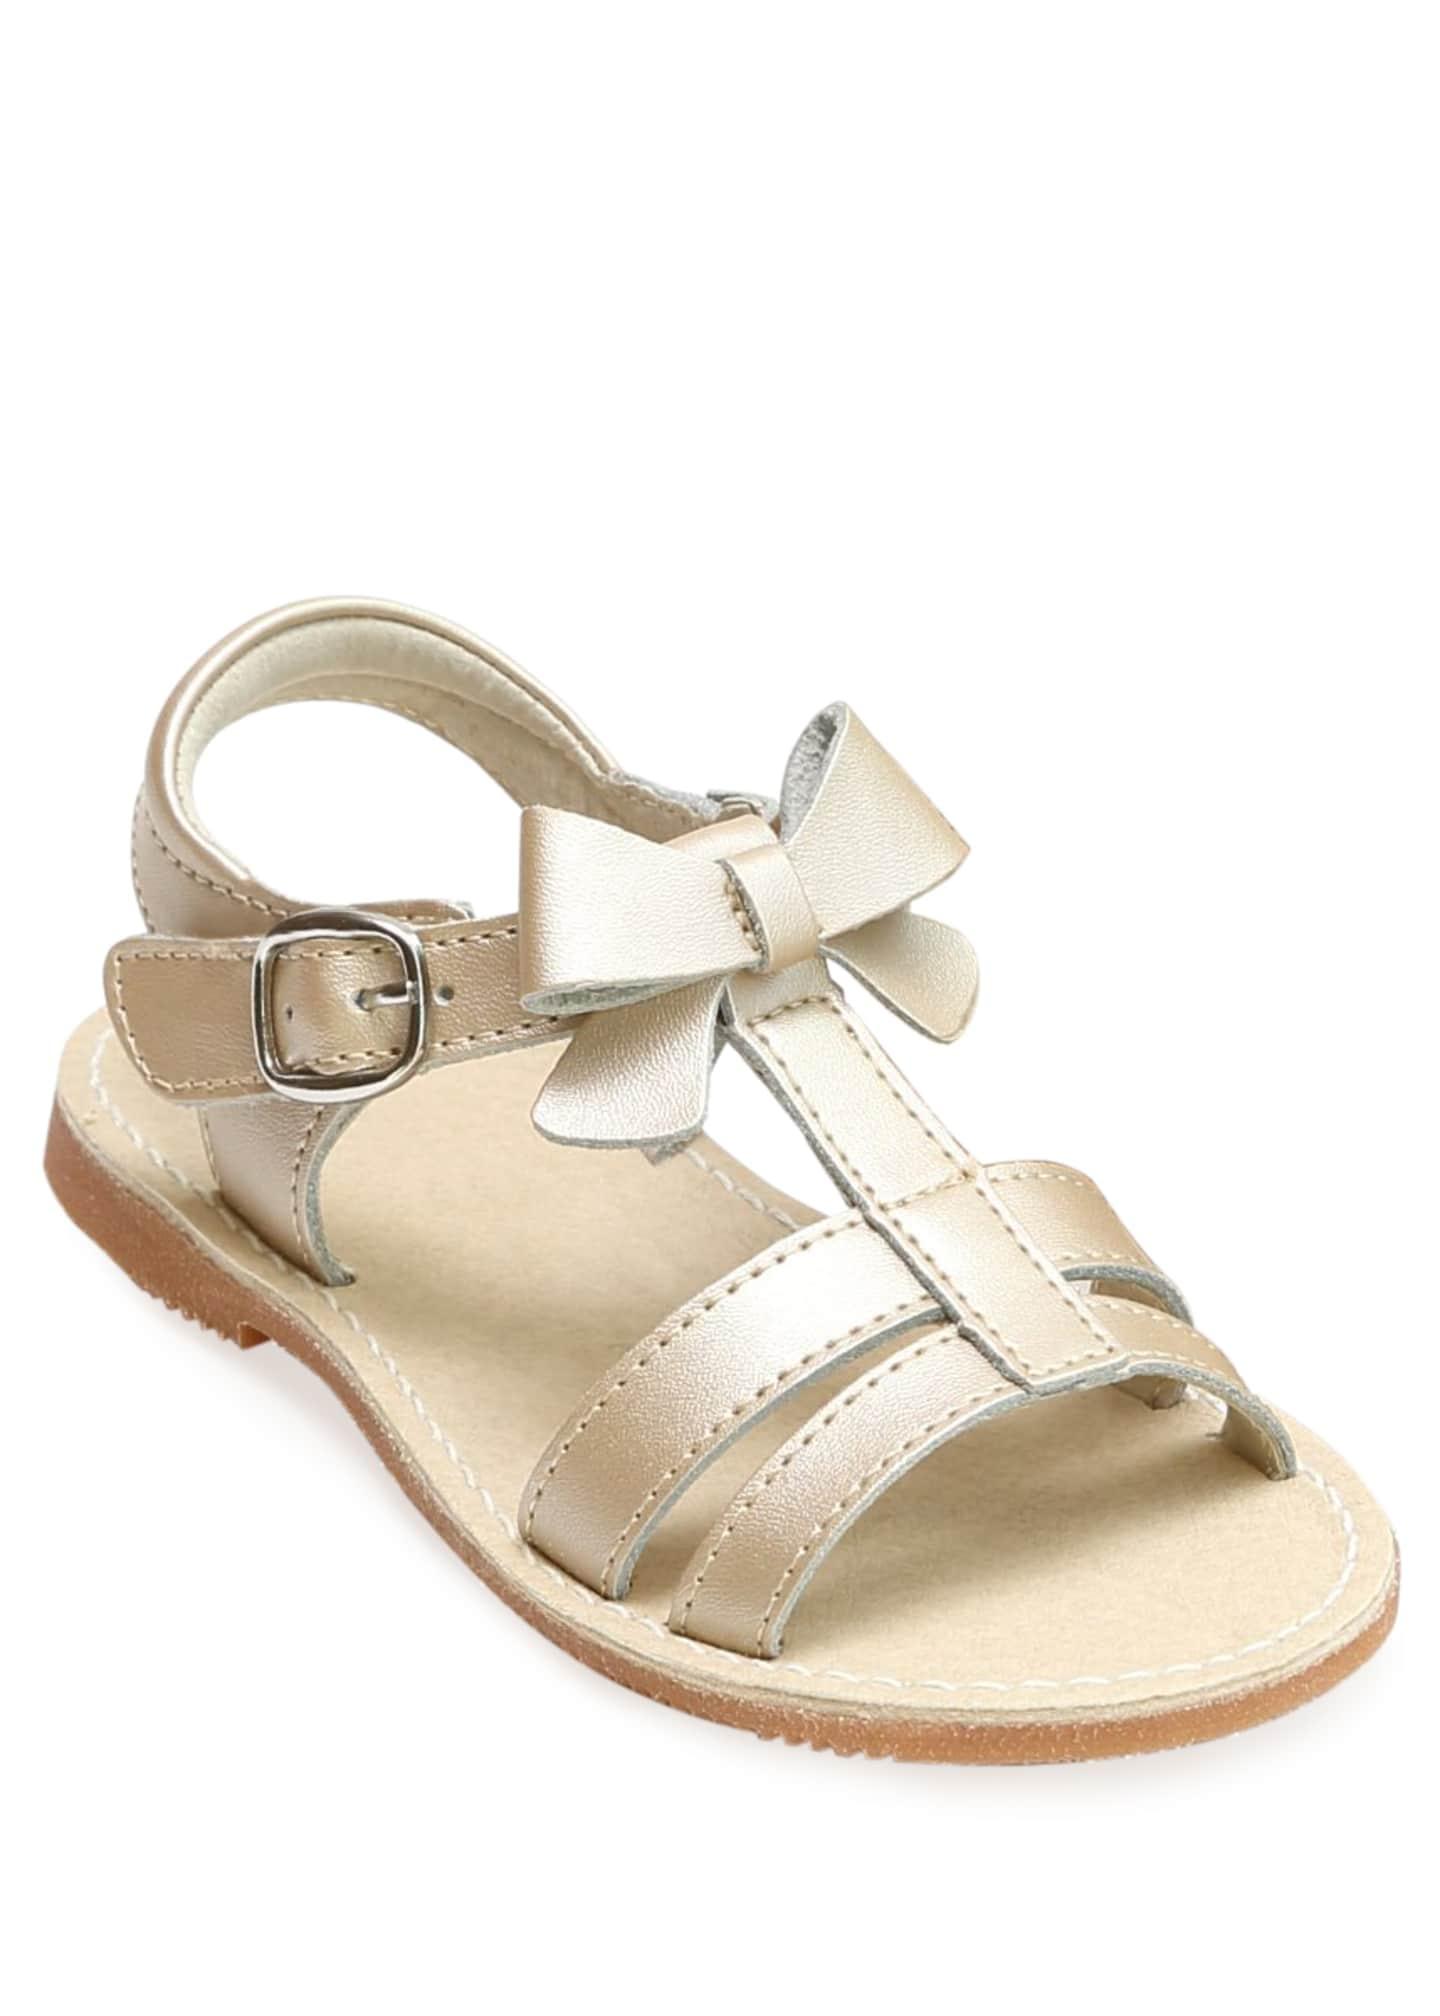 L'Amour Shoes Janie Leather T-Strap Bow Sandal, Kids